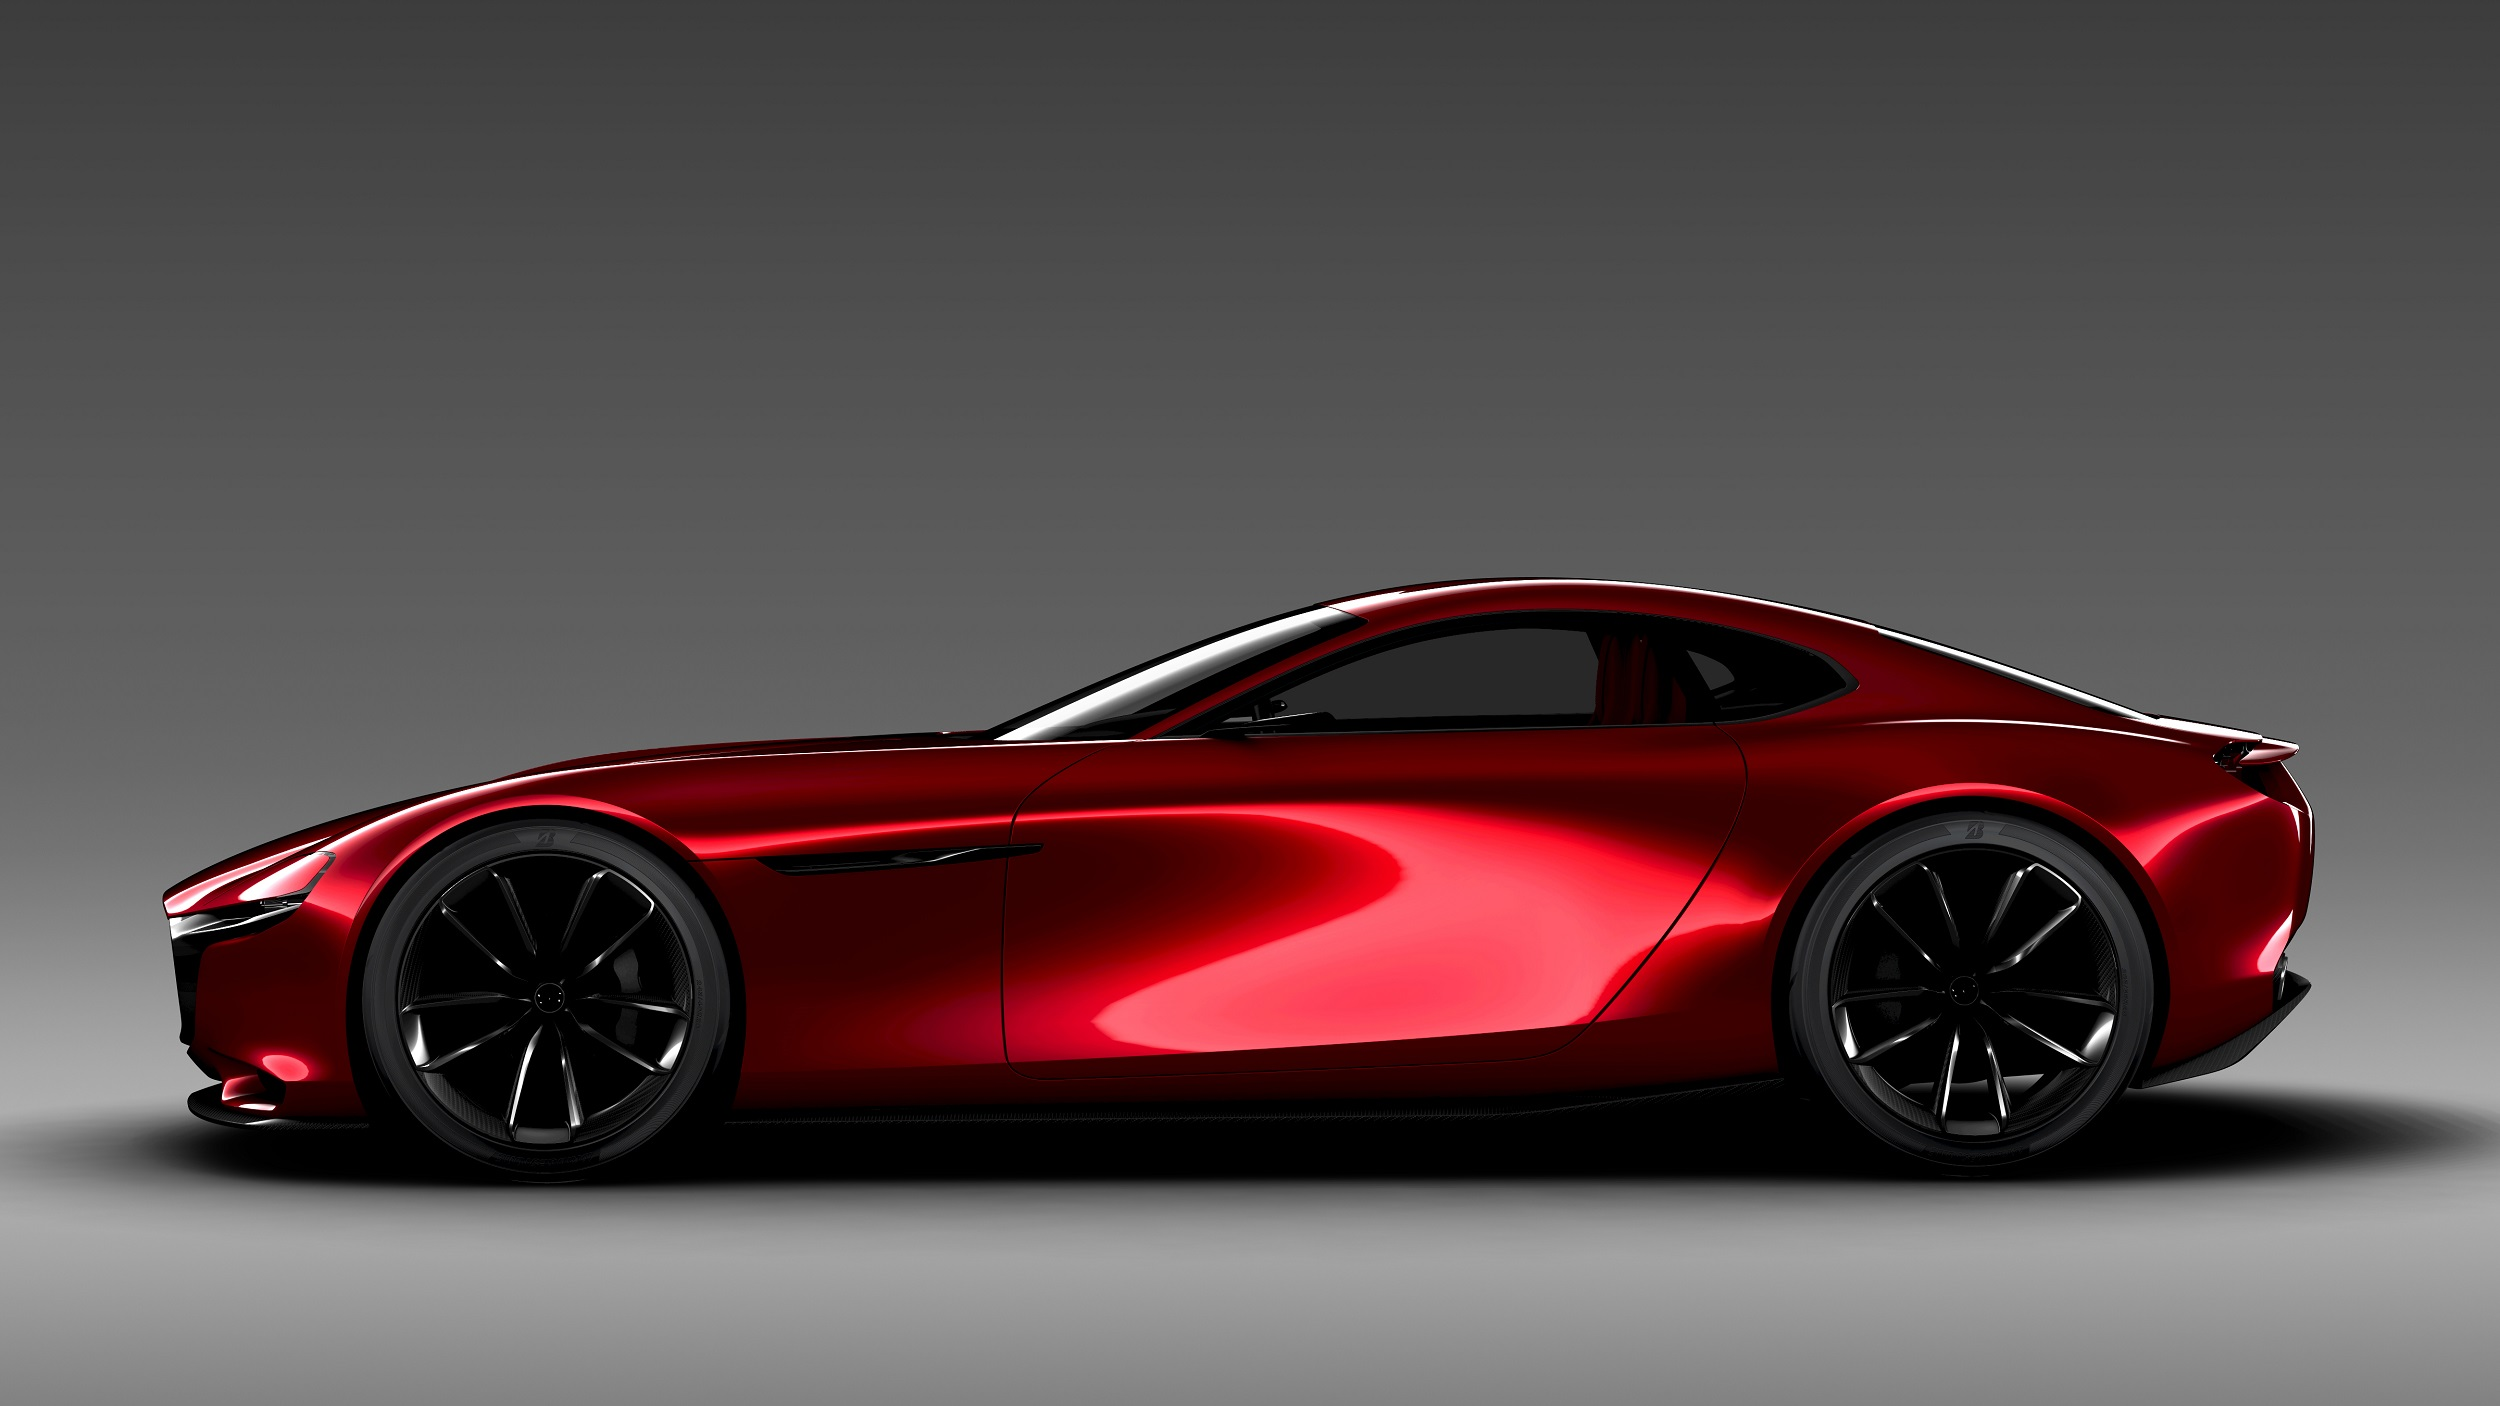 Mazda red concept car